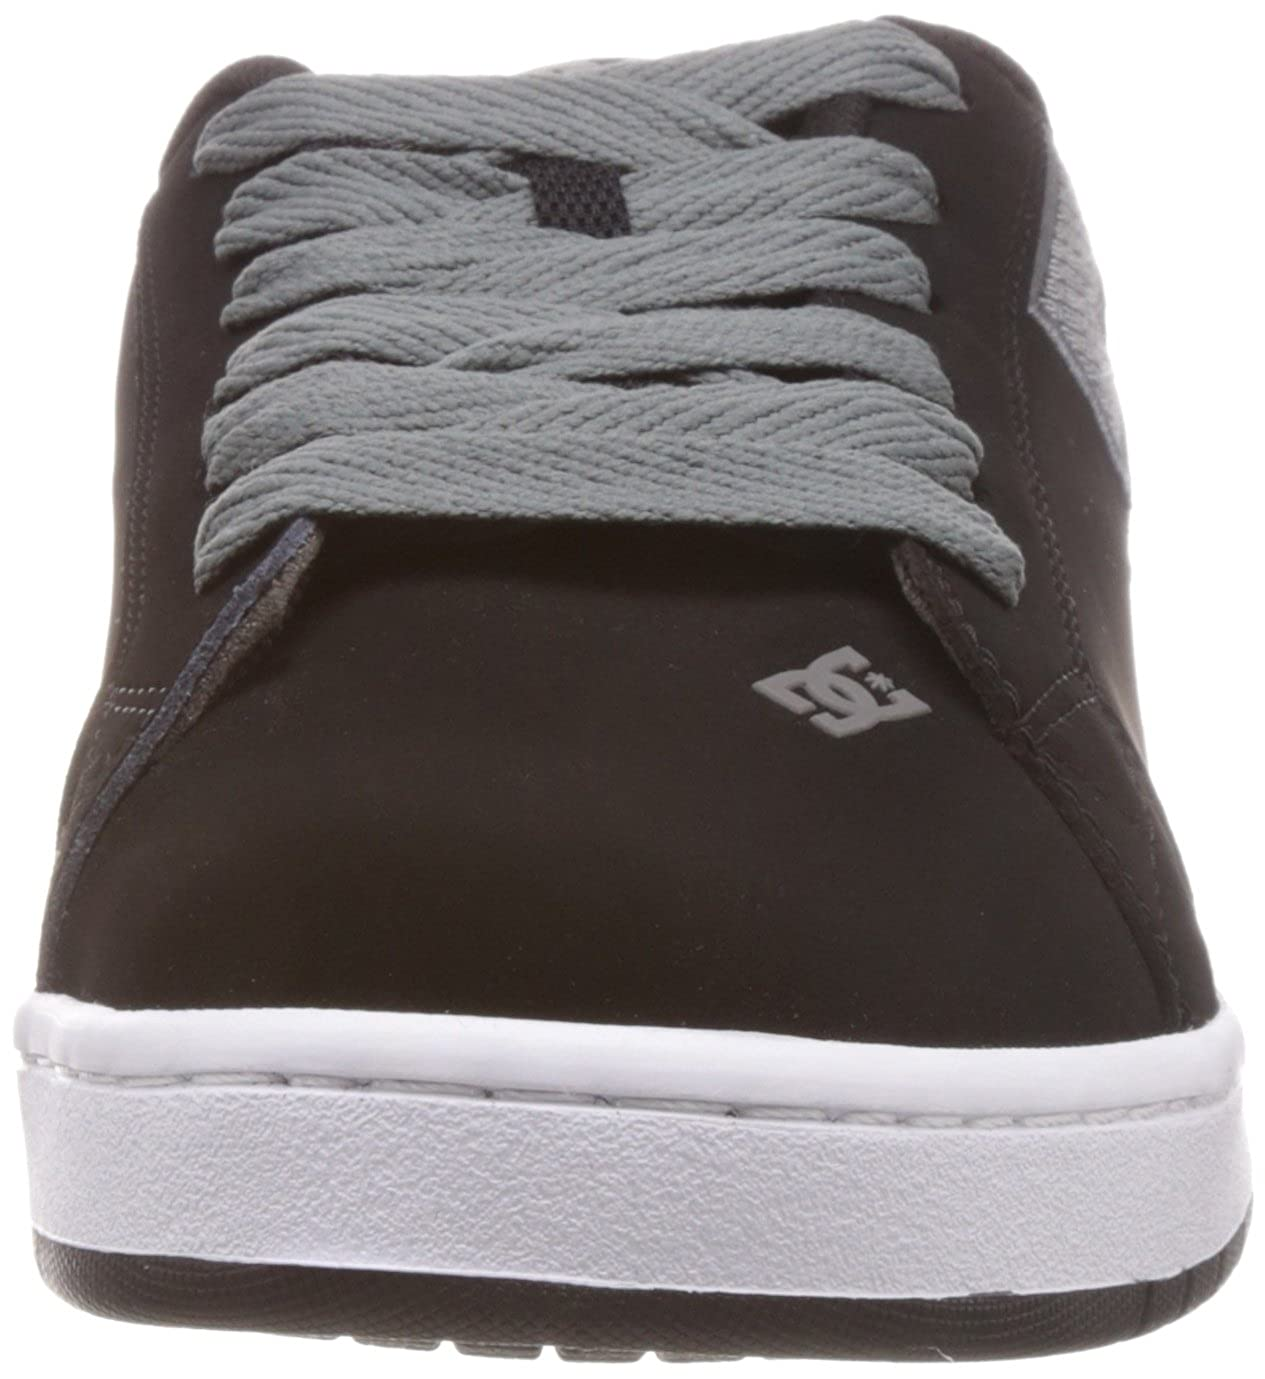 DC scarpe Court Graffik Se Uomo Shoe, scarpe da da da ginnastica Uomo 25efeb